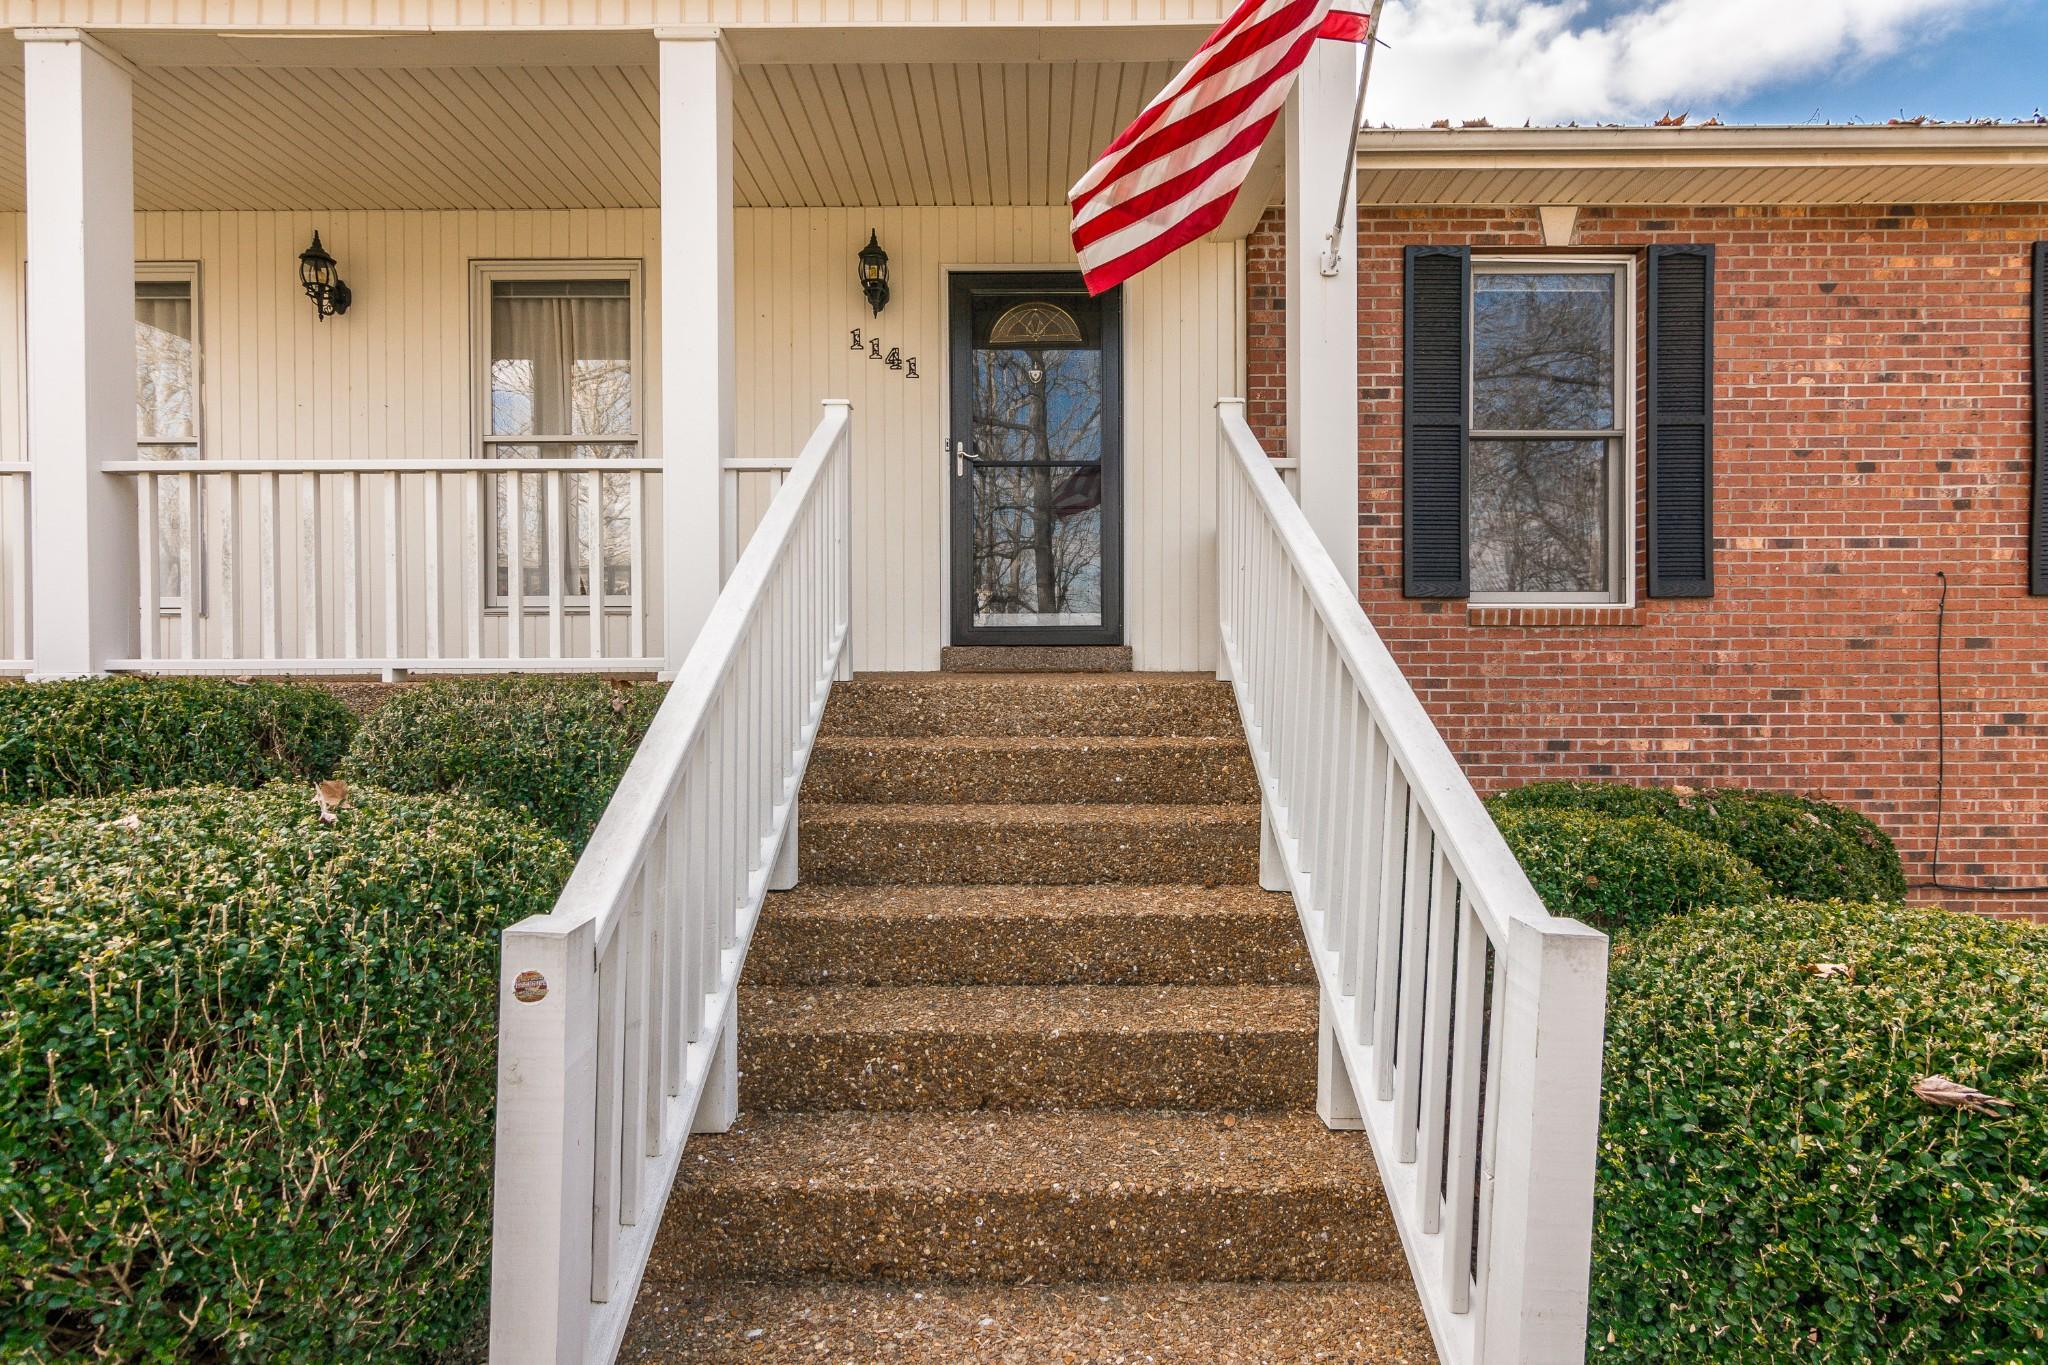 1141 Morriswood Dr, Joelton, TN 37080 - Joelton, TN real estate listing